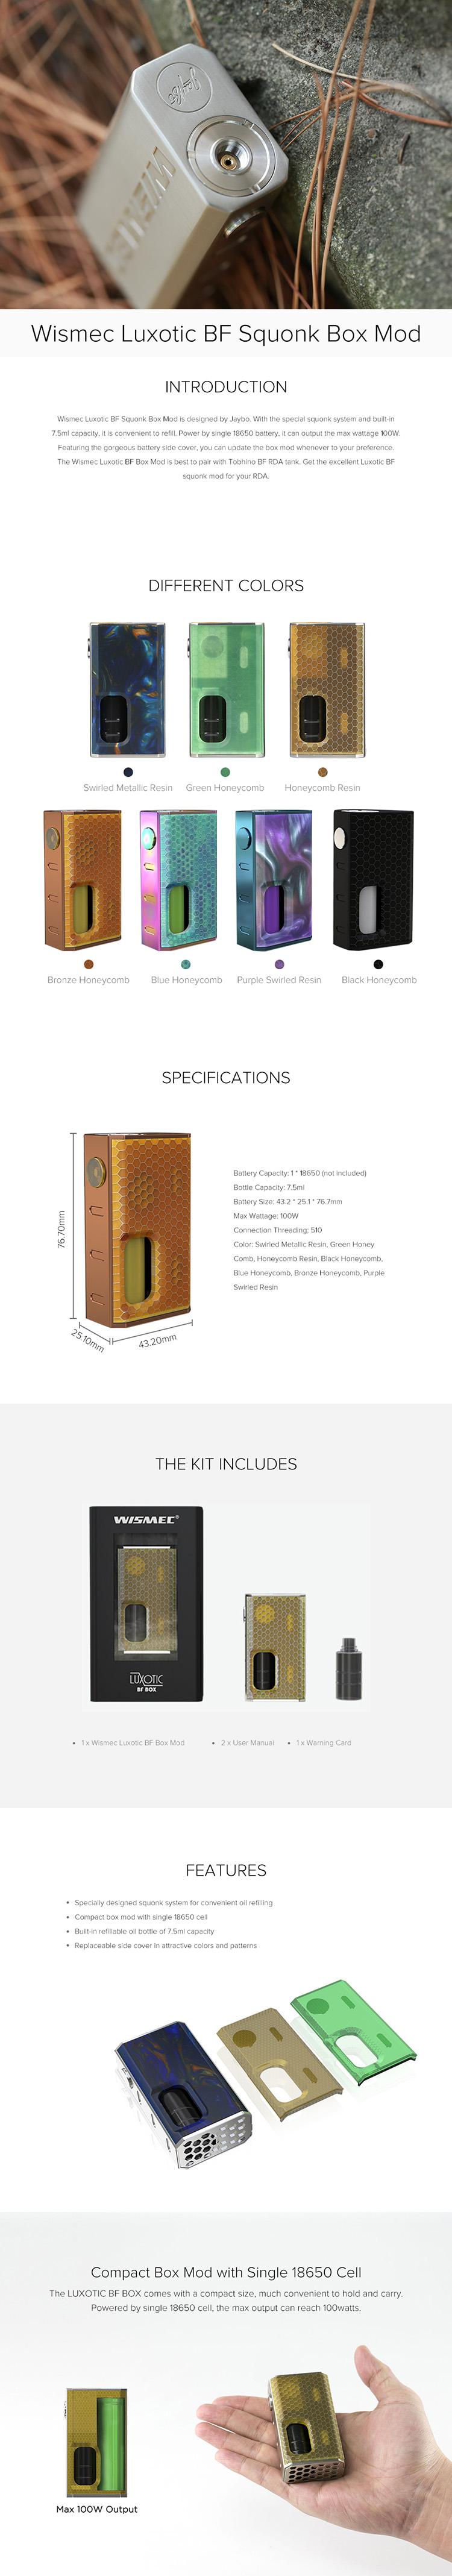 Wismec Luxotic BF Squonk Box Mod